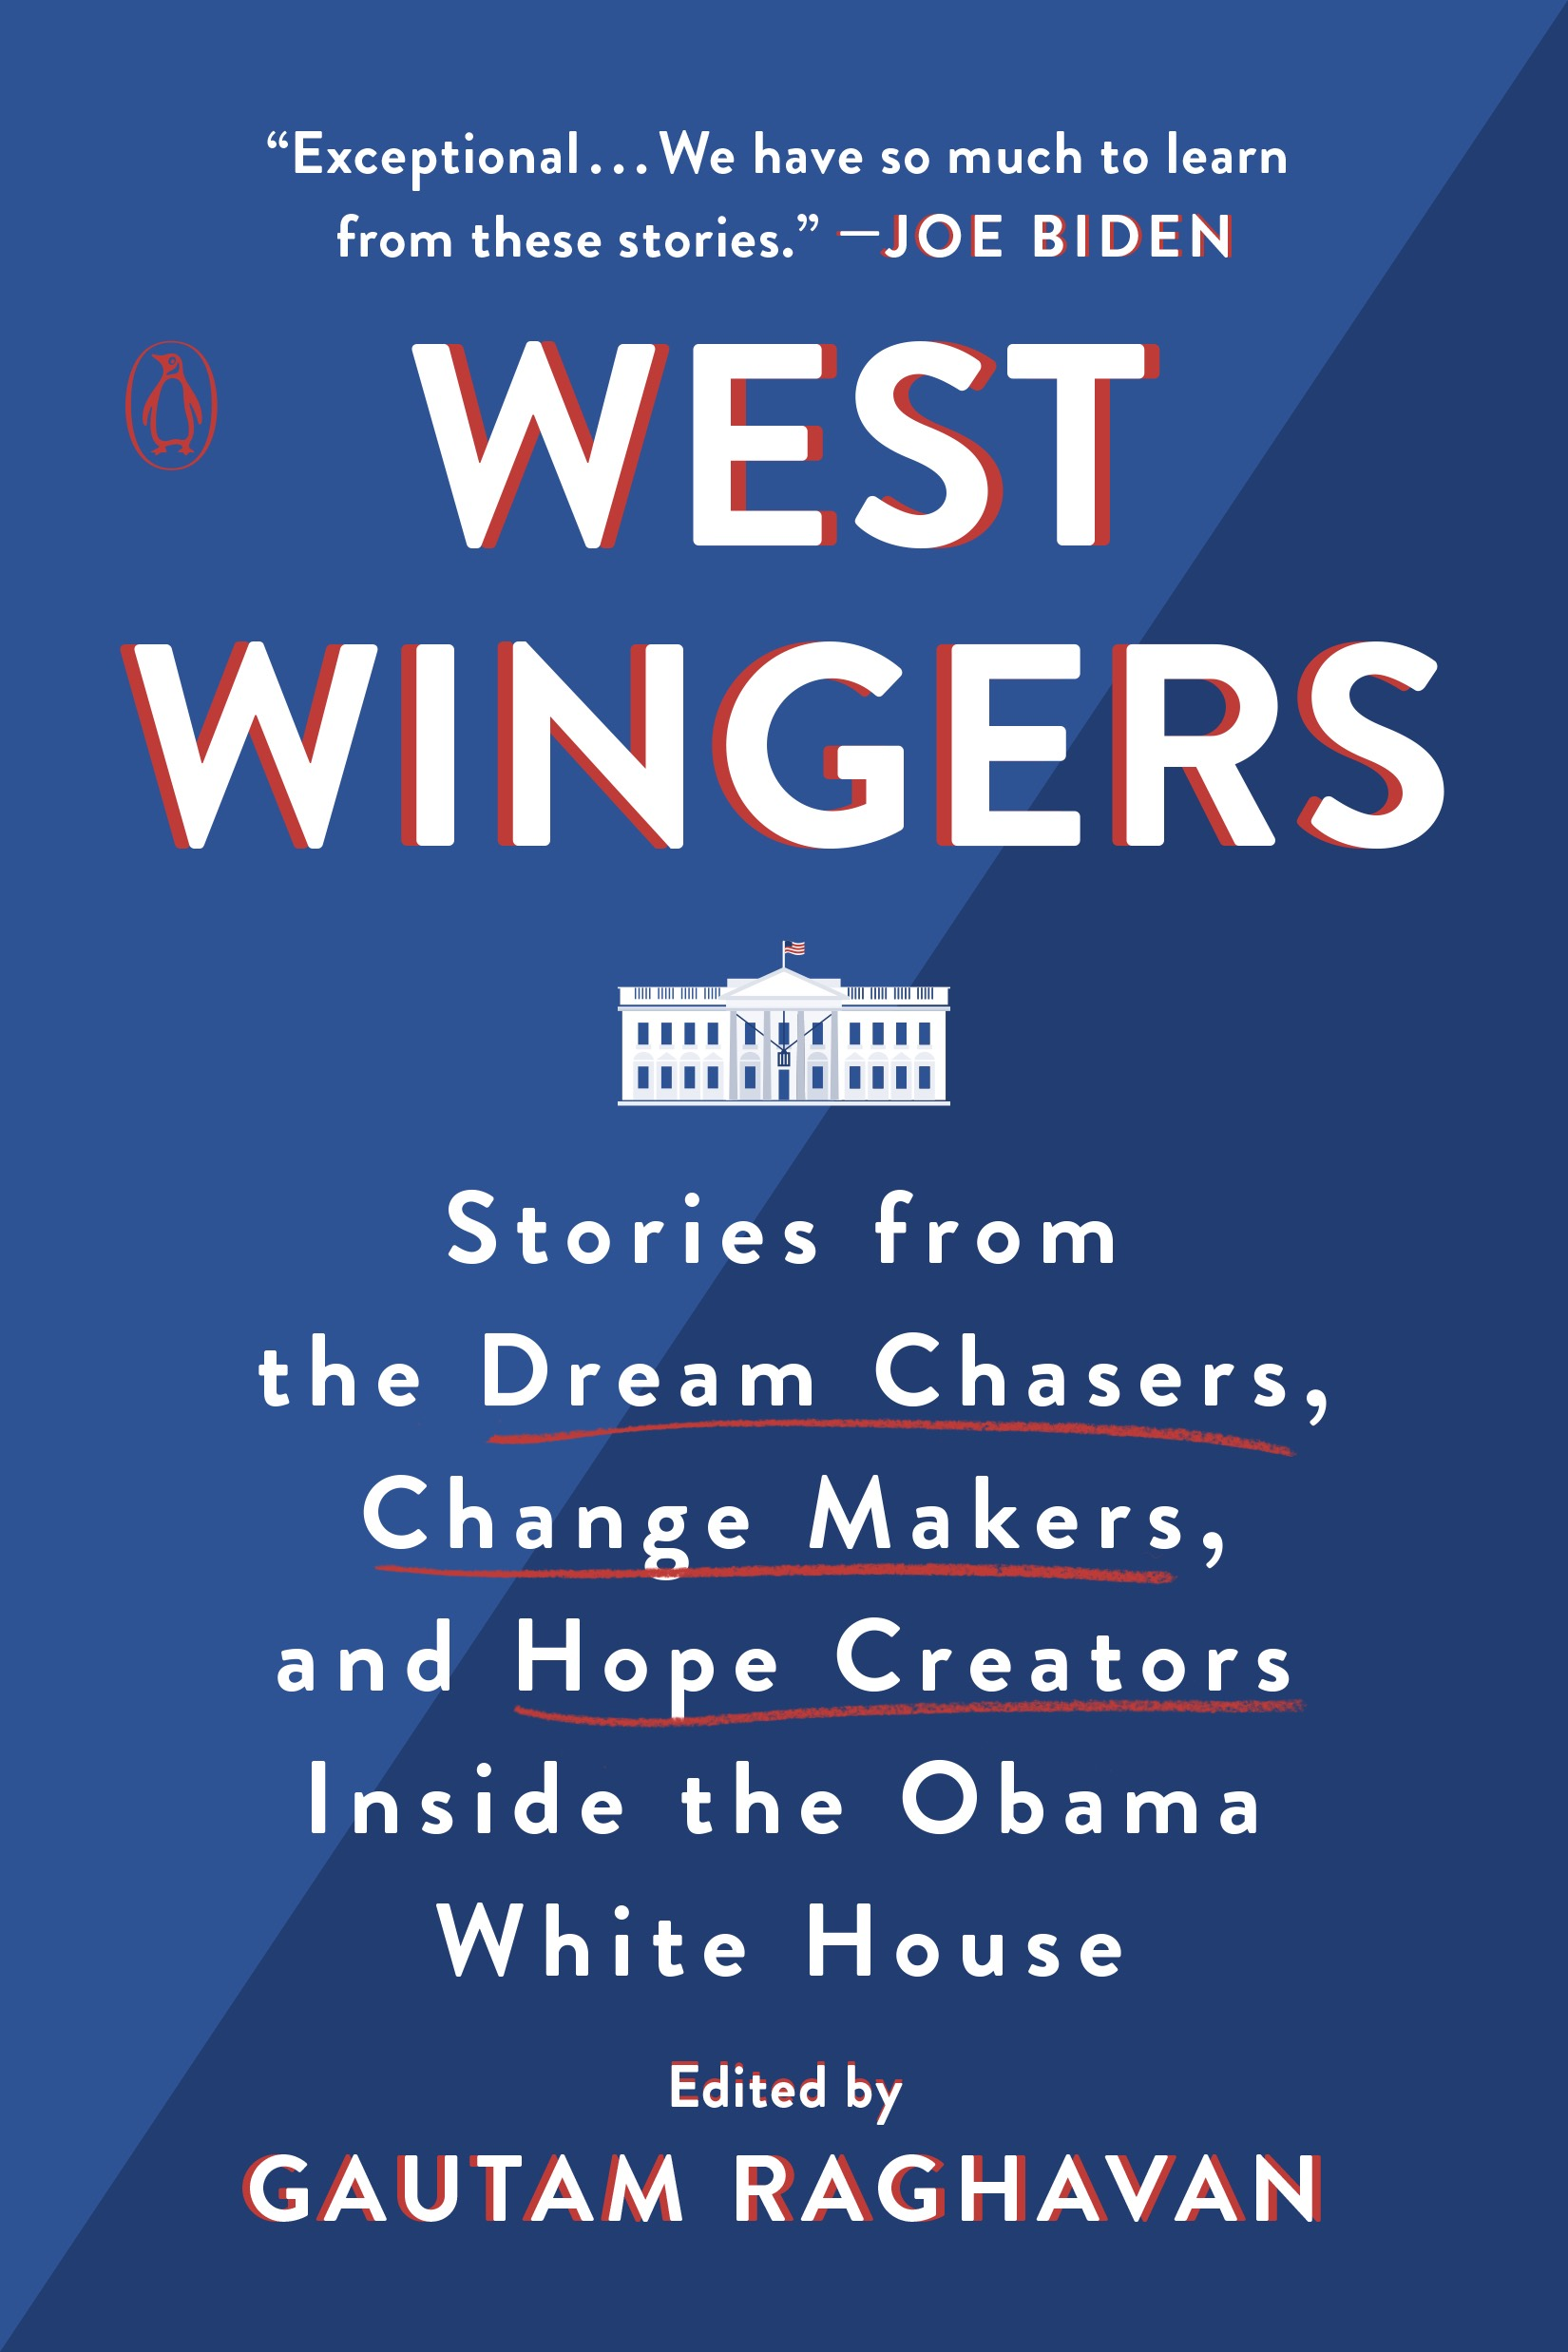 WW cover.jpg